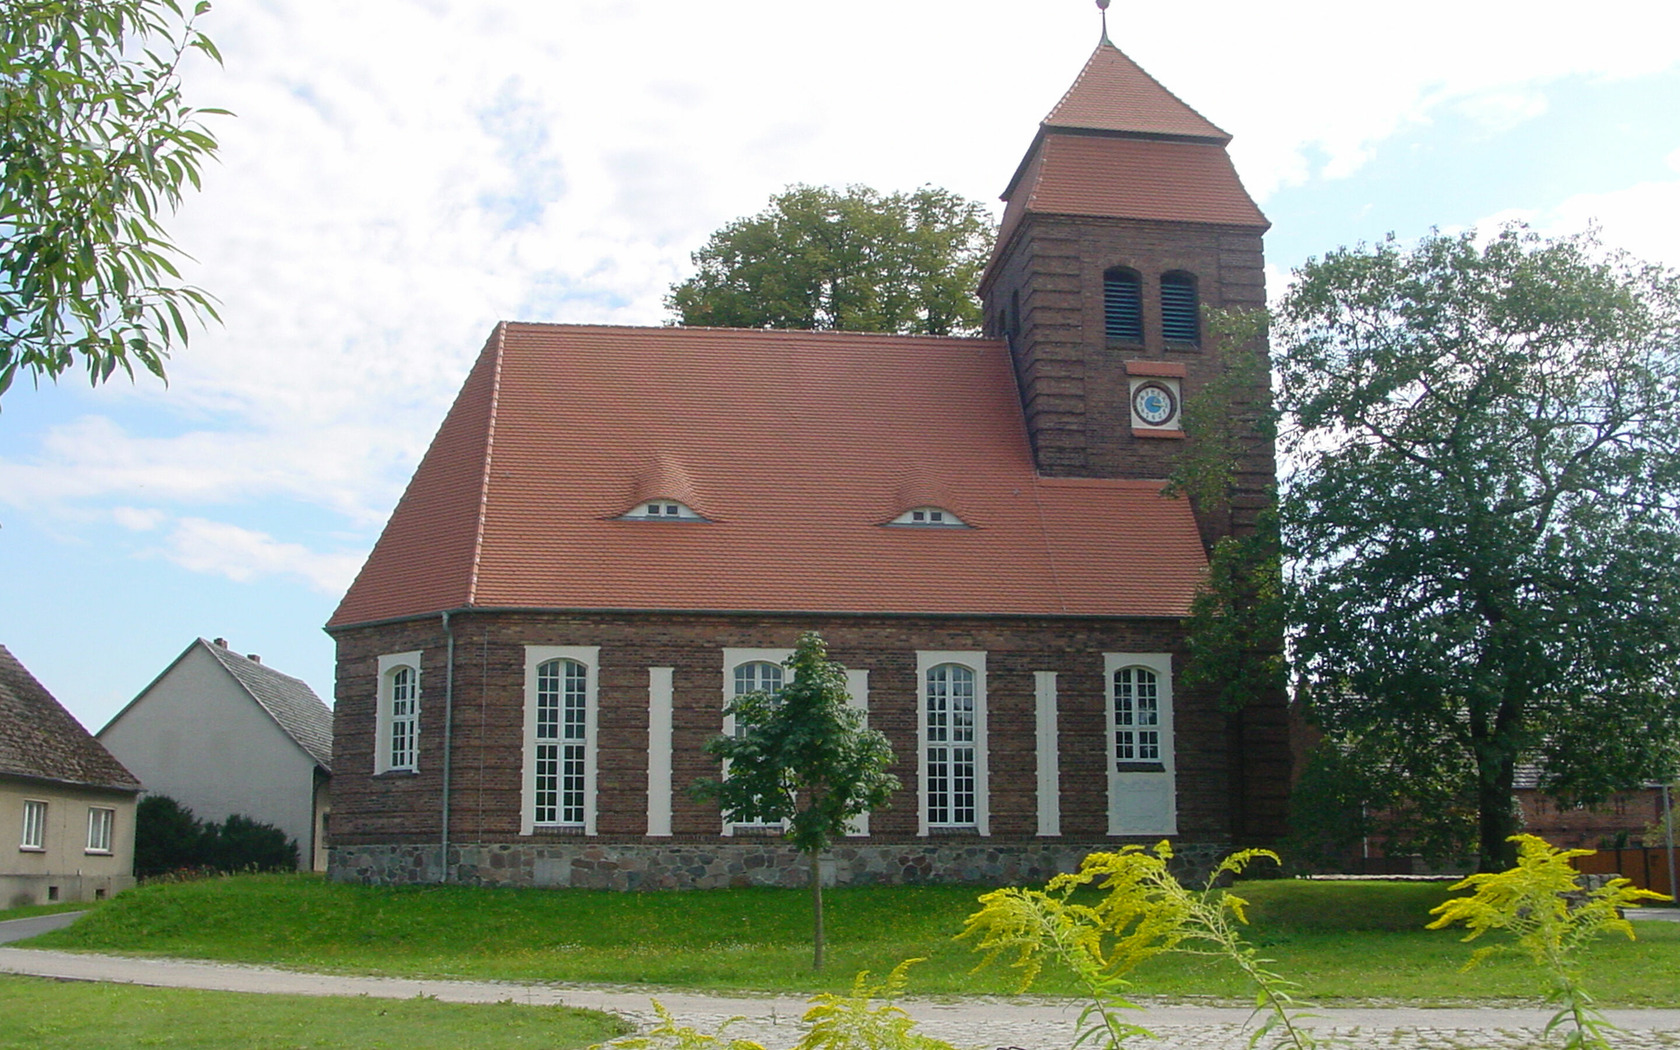 Kirche Pinnow, Foto: Doreen Noack, Lizenz: Doreen Noack